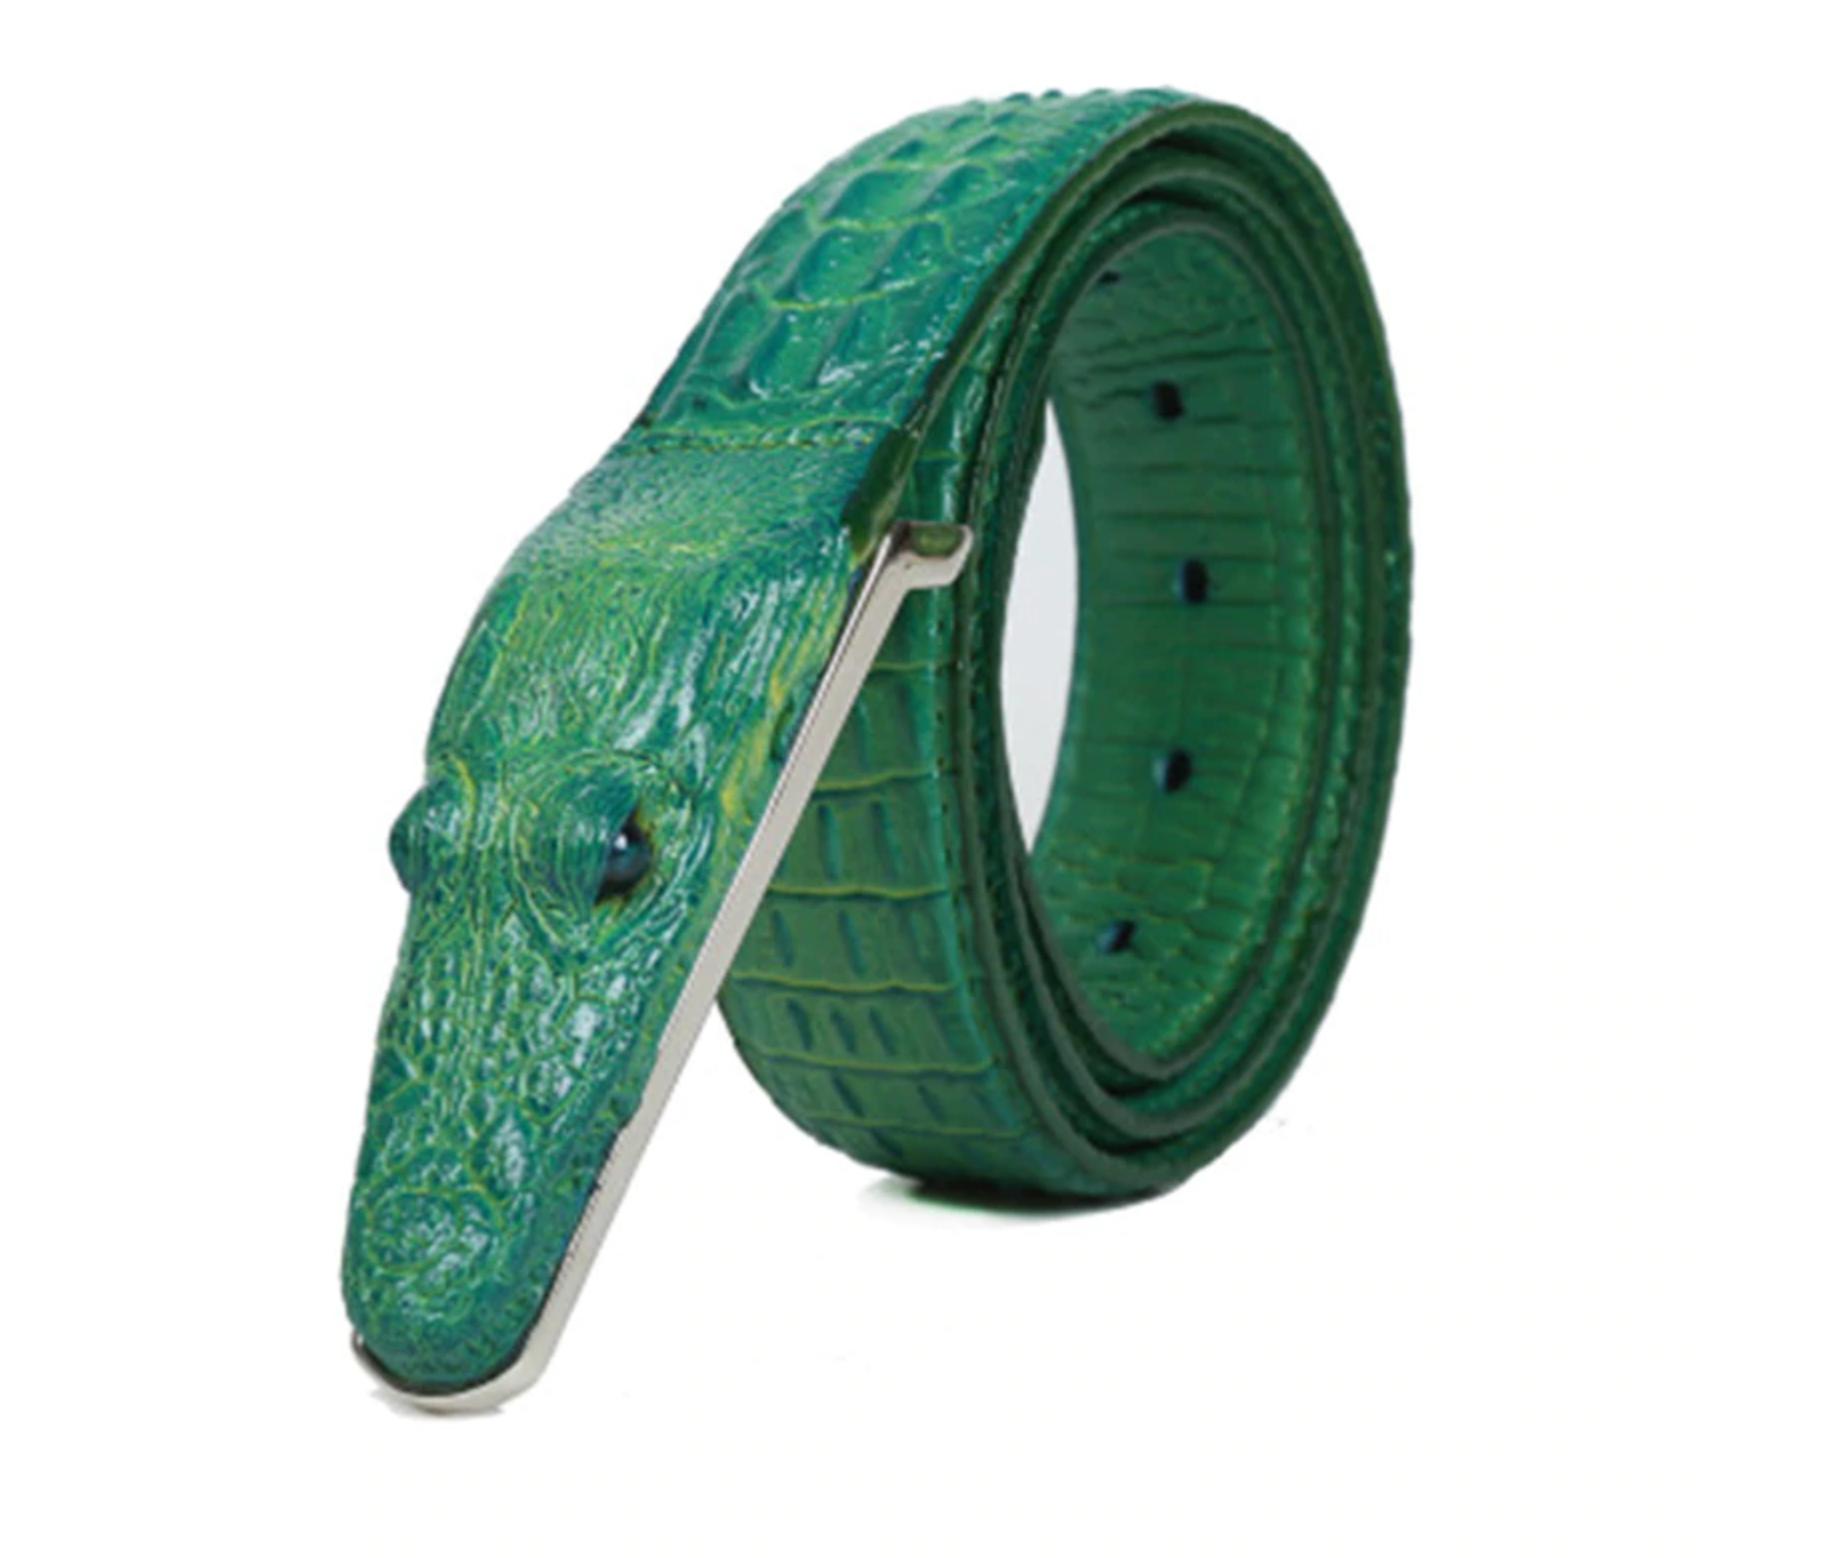 Ceinture cuir tête crocodile homme marque boho boheme chic BELT0077